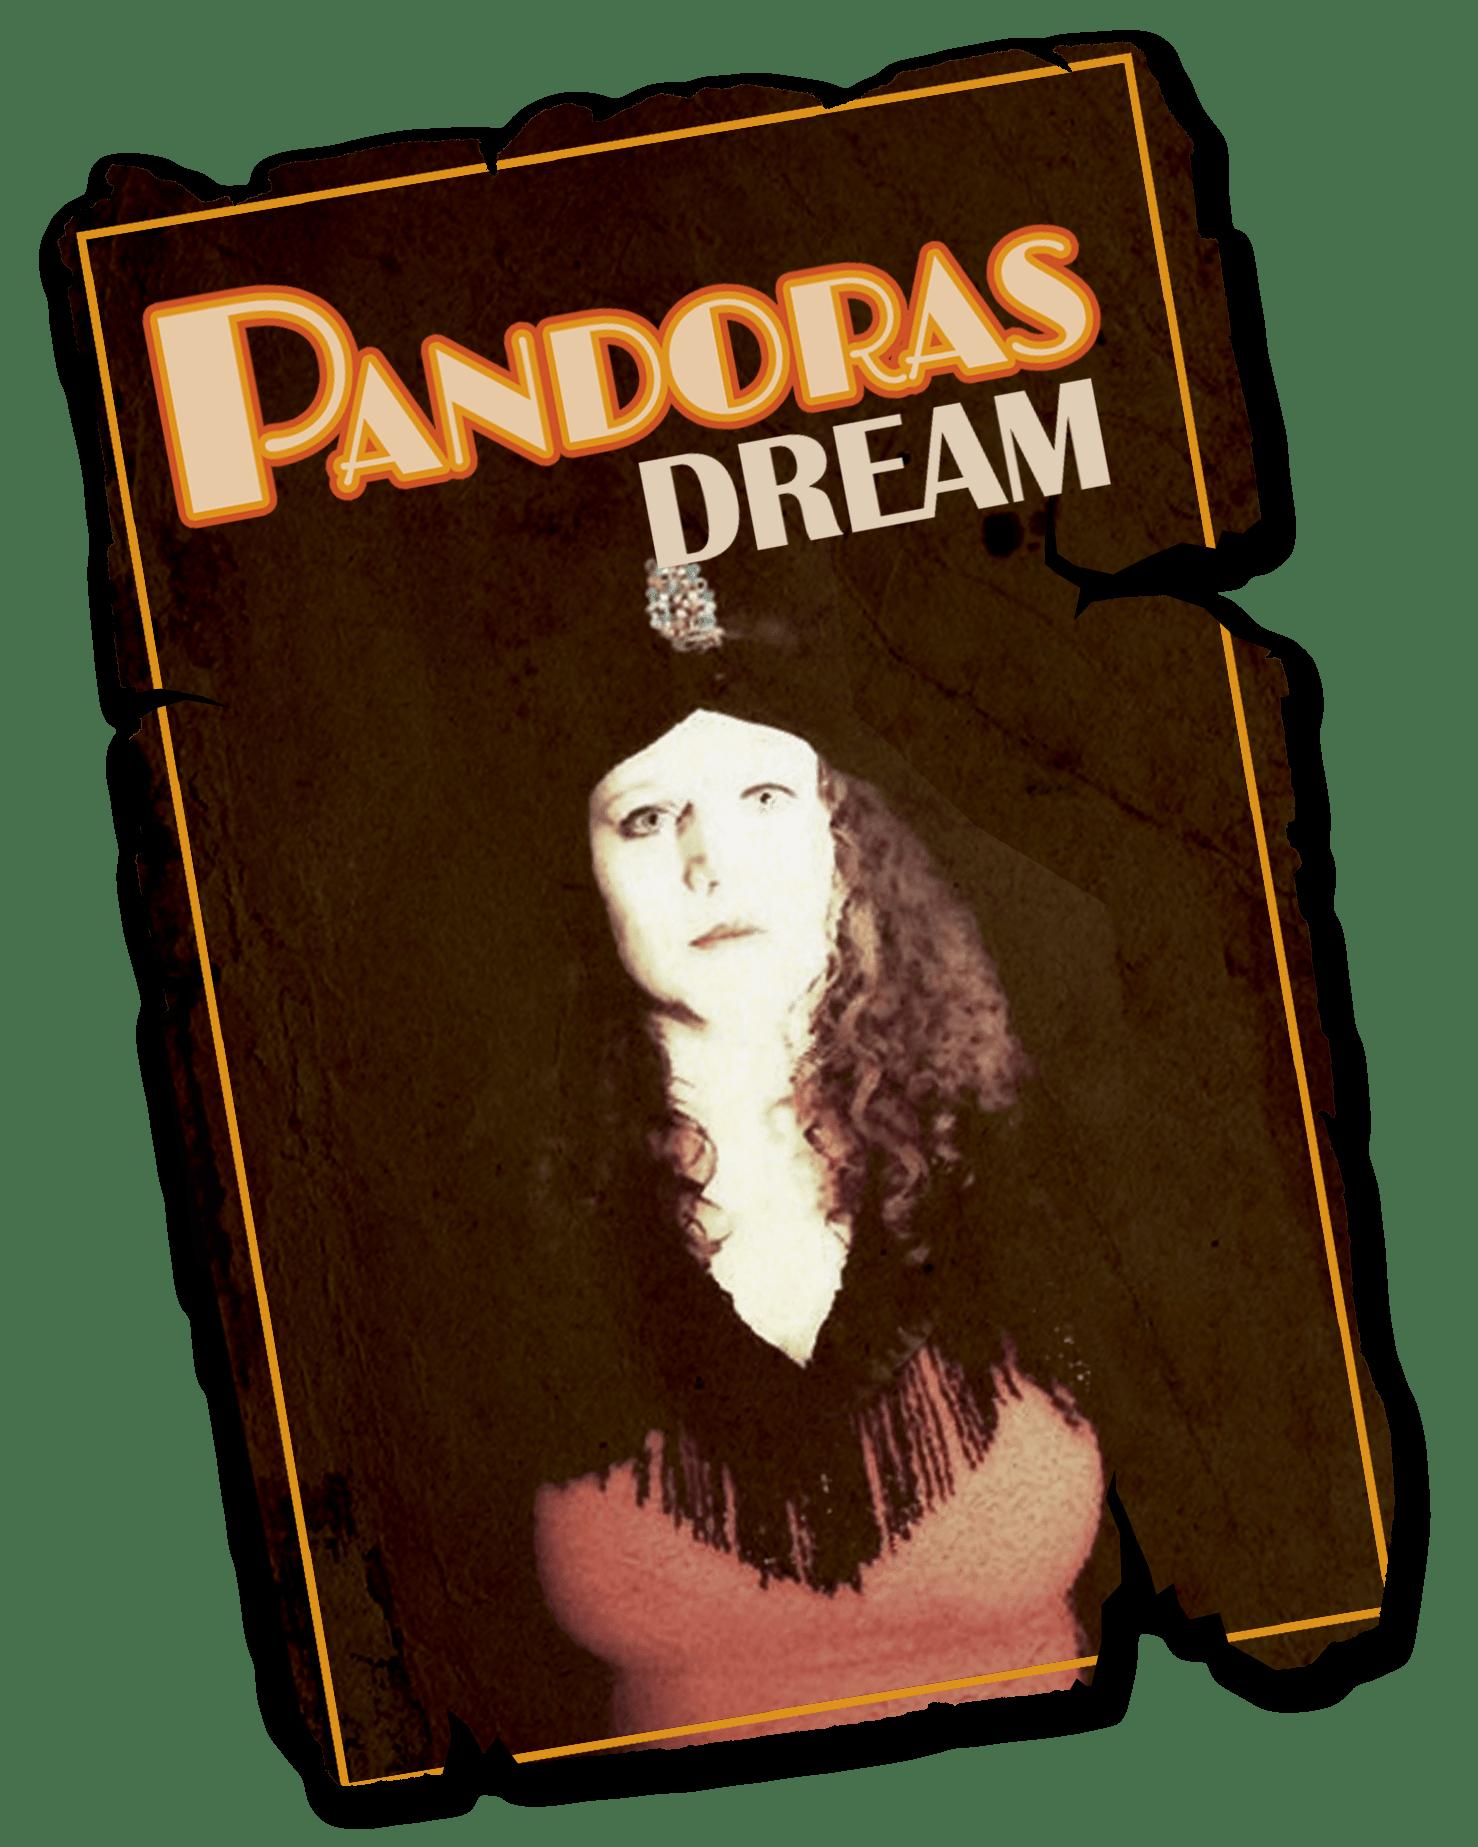 Pandoras dream poster / Pandoras drøm plakat